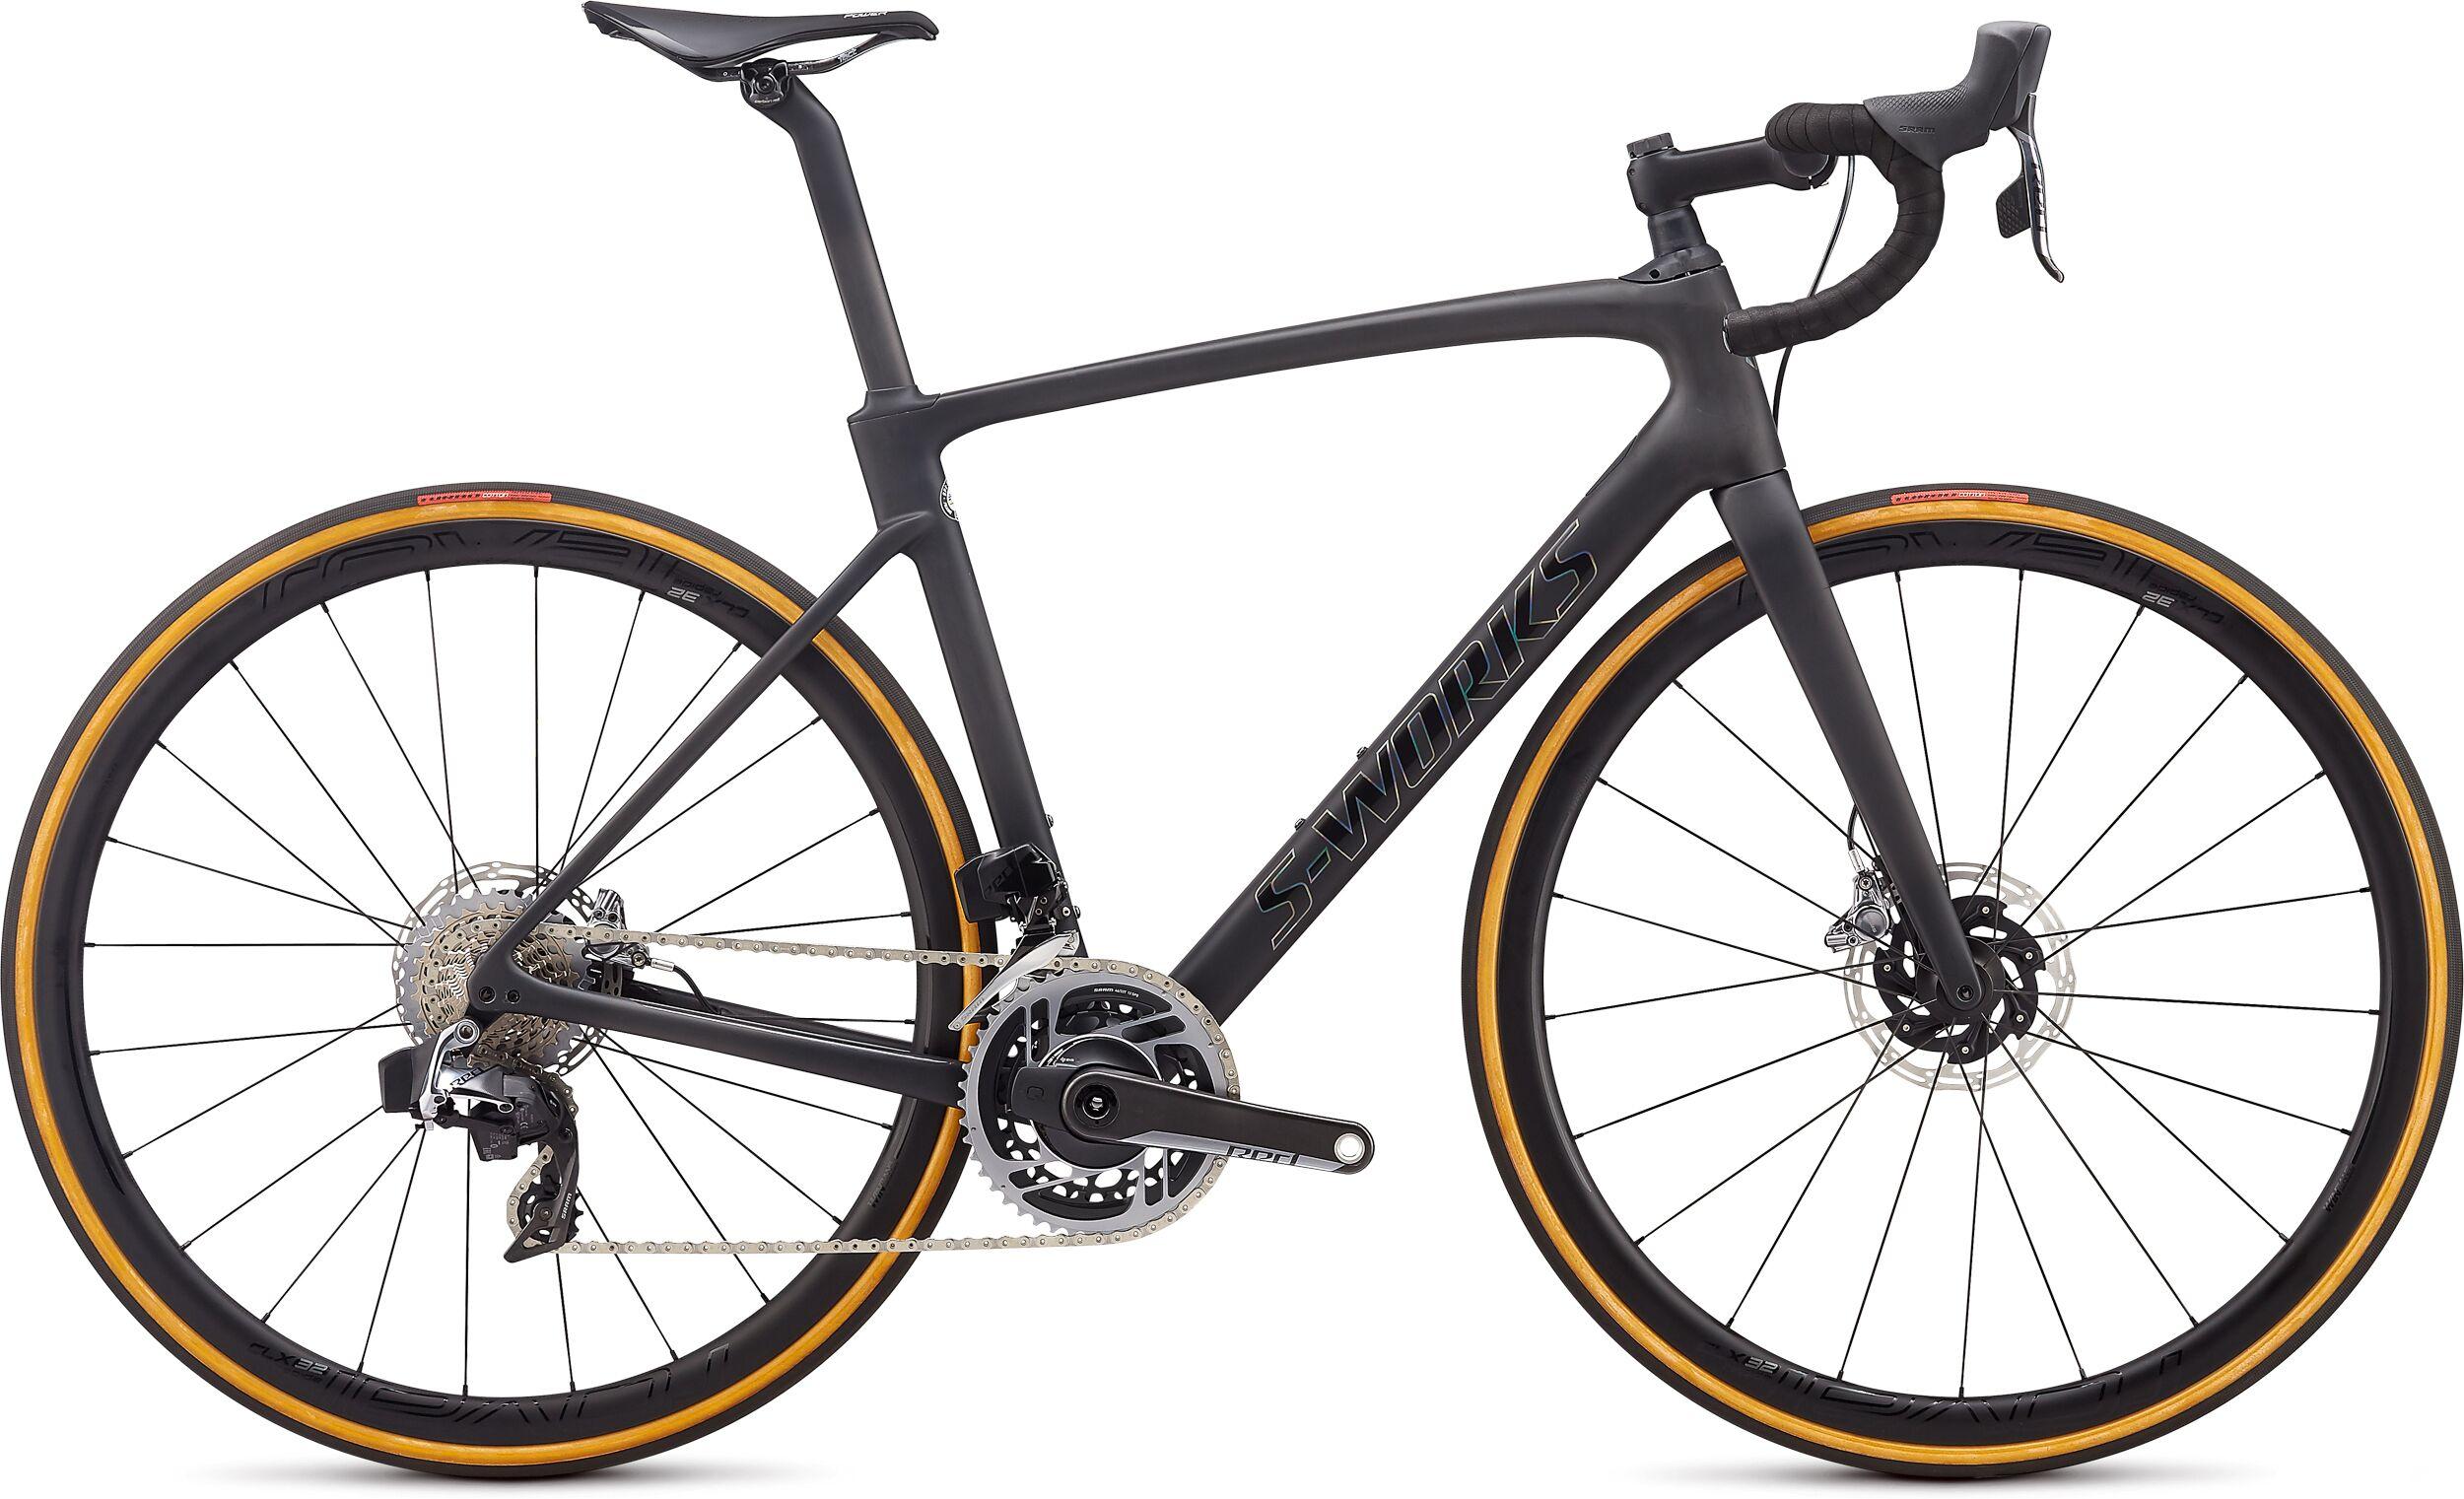 Specialized SWorks Roubaix SRAM eTap AXS Road Bike 2020 Tarmac/Crystal